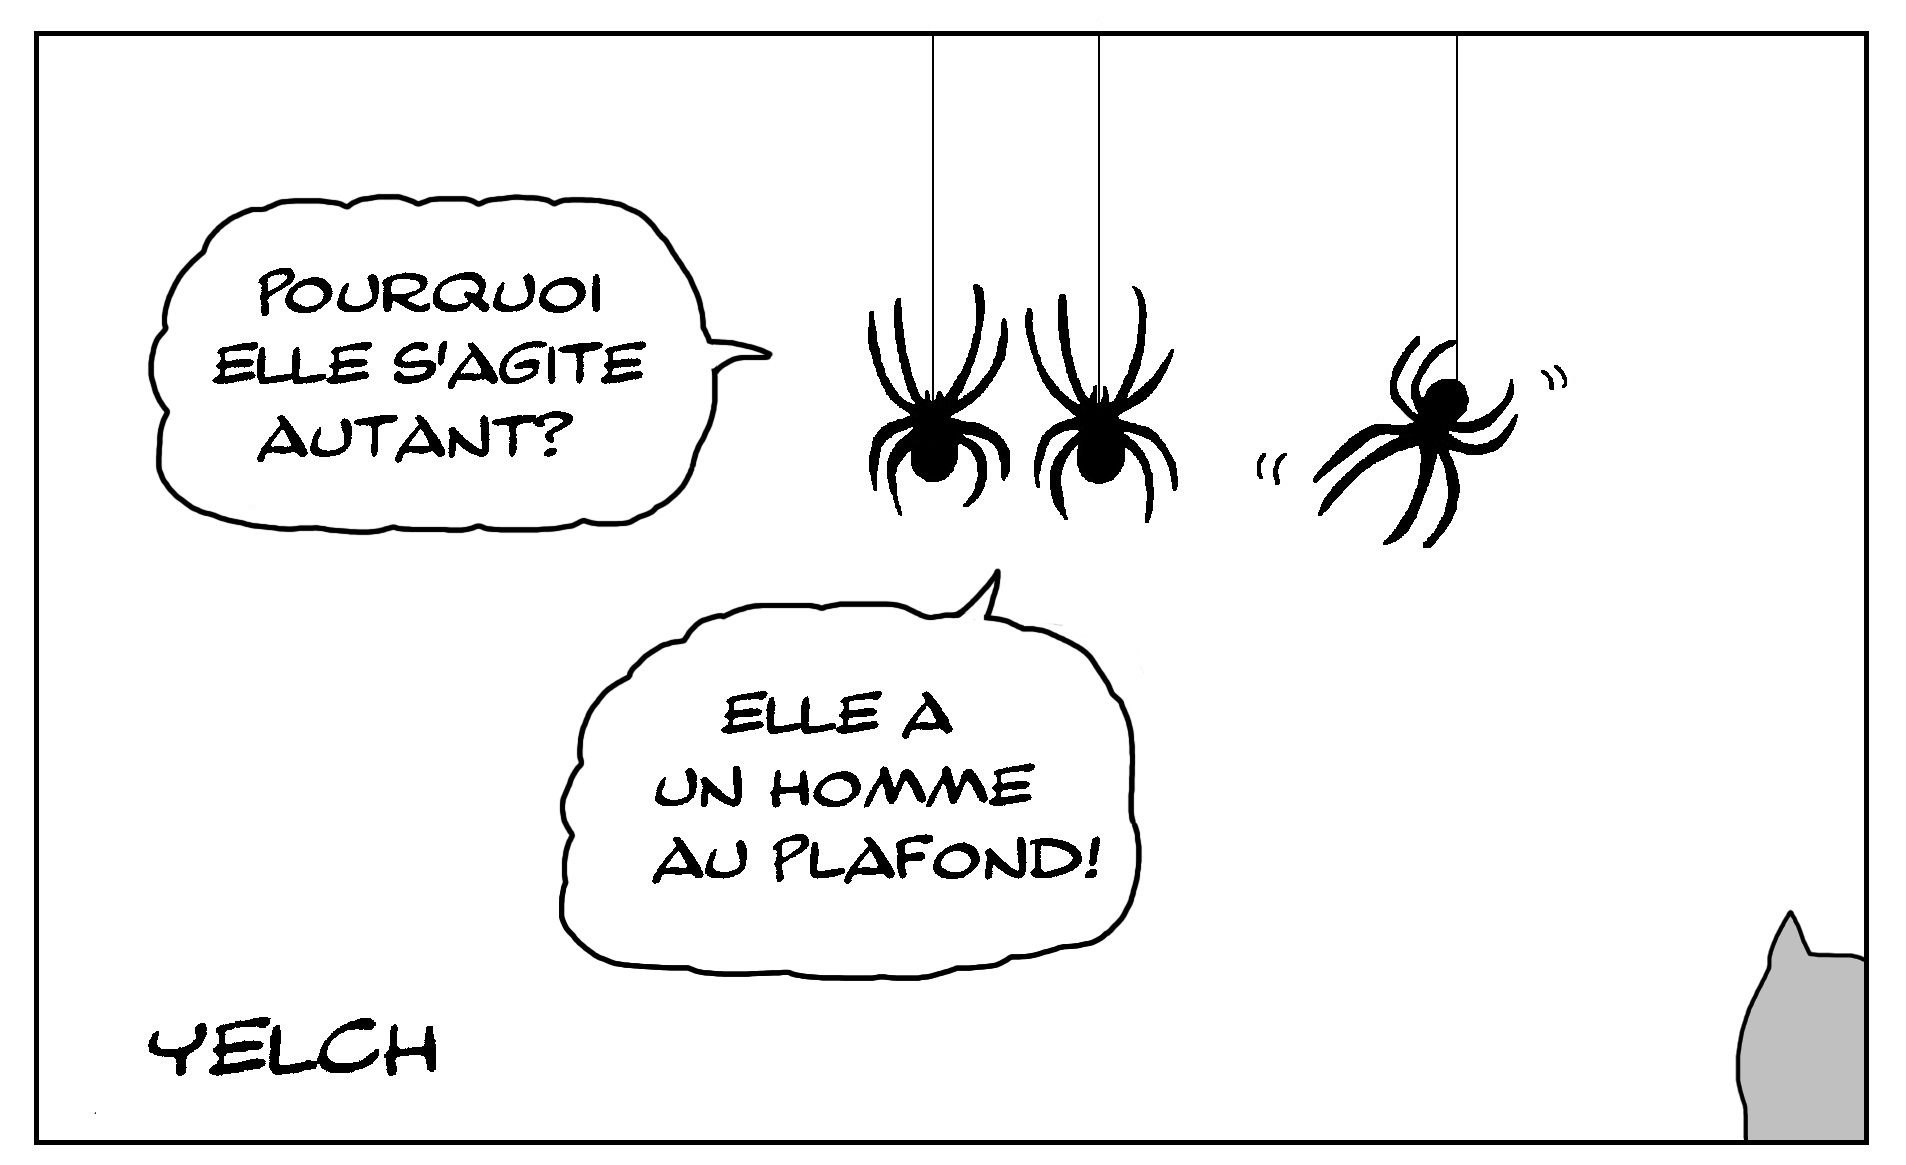 Dessin D'arachnides – Blagues Et Dessins concernant Dessiner Une Araignee